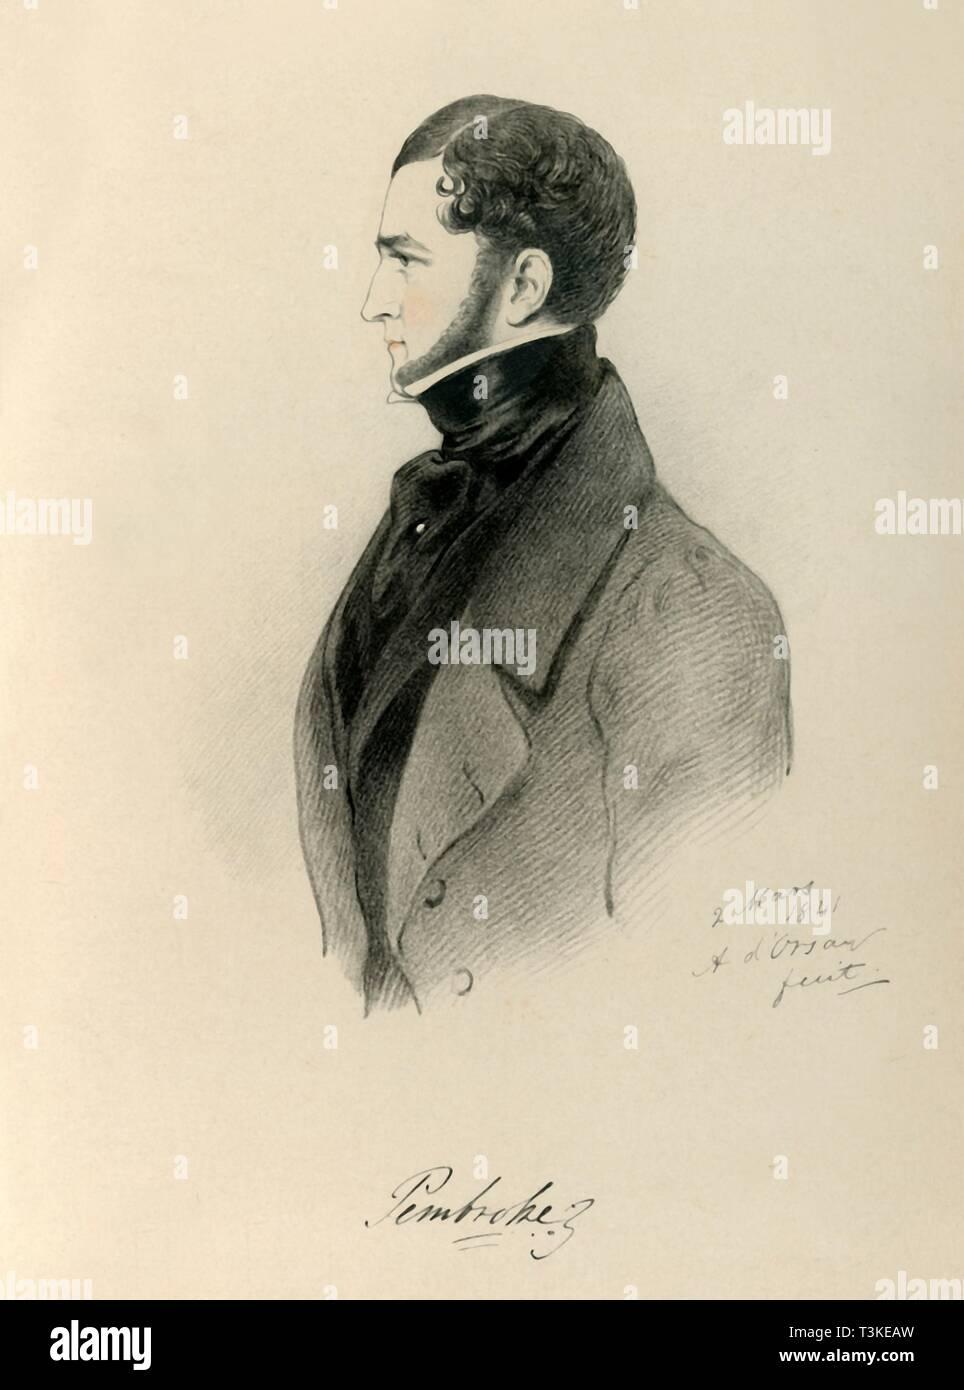 'Pembroke', 1841. Creator: Richard James Lane. - Stock Image